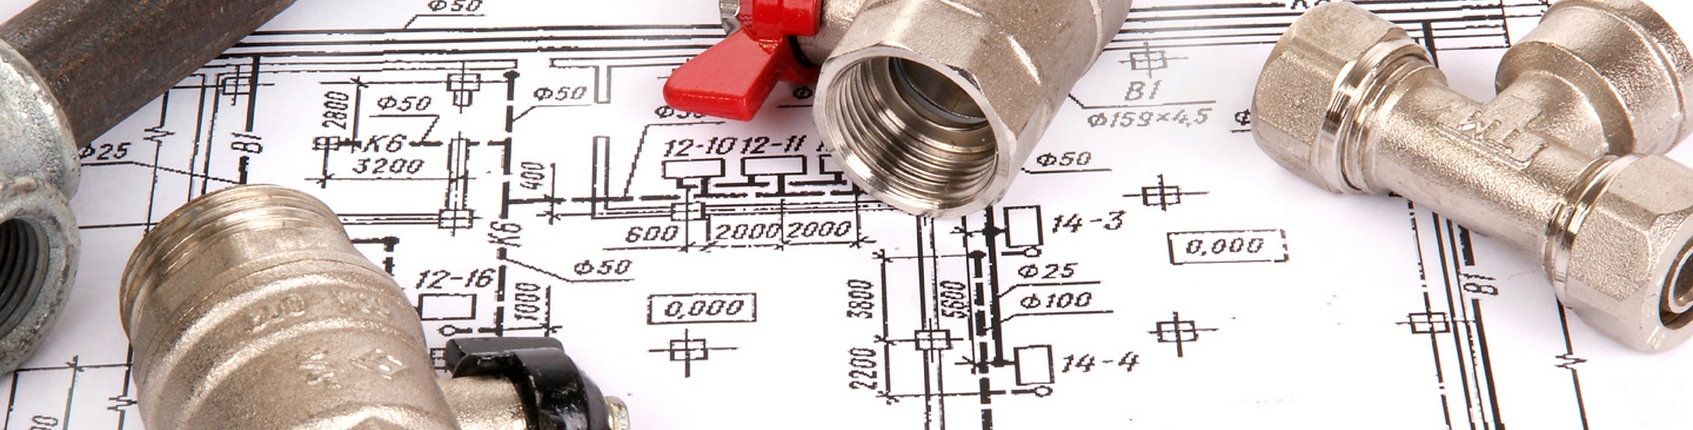 Choosing-a-plumber-in-coquitlam-5 1